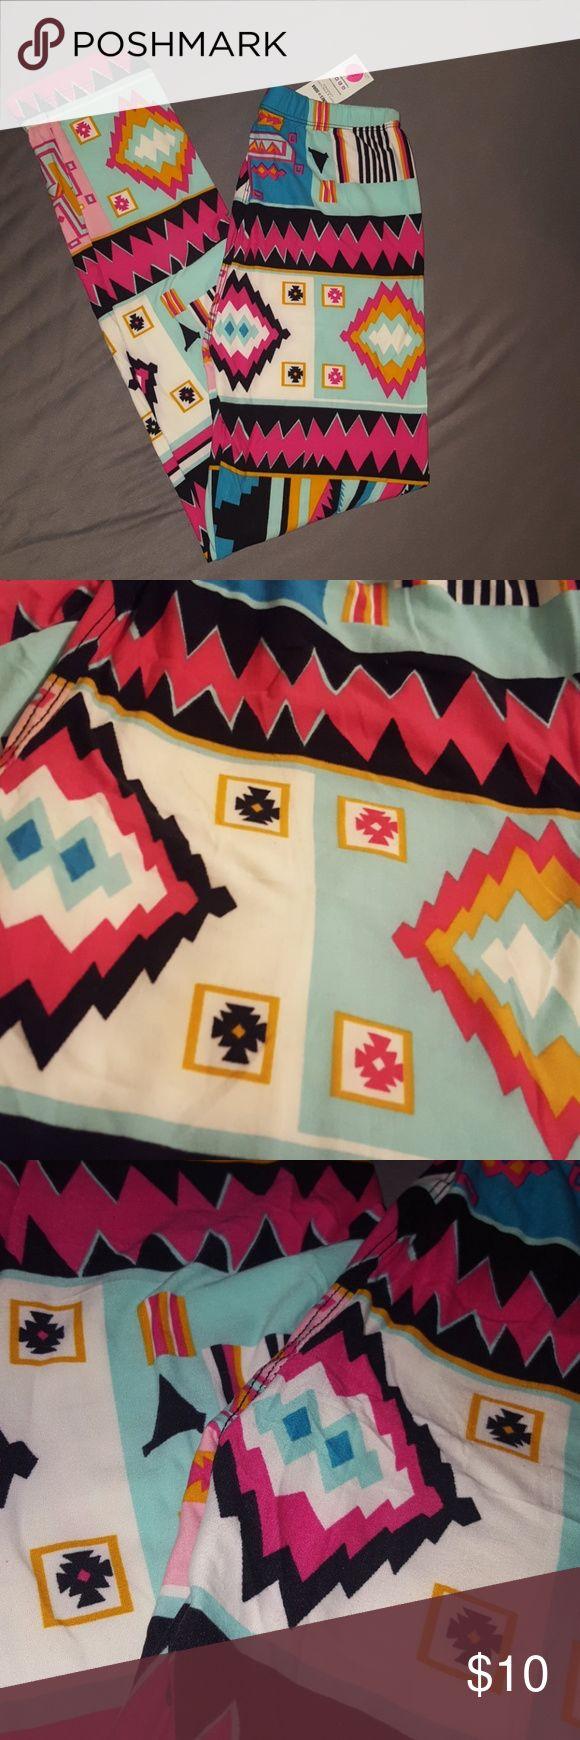 NWT. Agnes & Dora Aztec Print Leggings NWT. Aztec print leggings. Beautiful bright colors. Non rep sale. Agnes & Dora Other